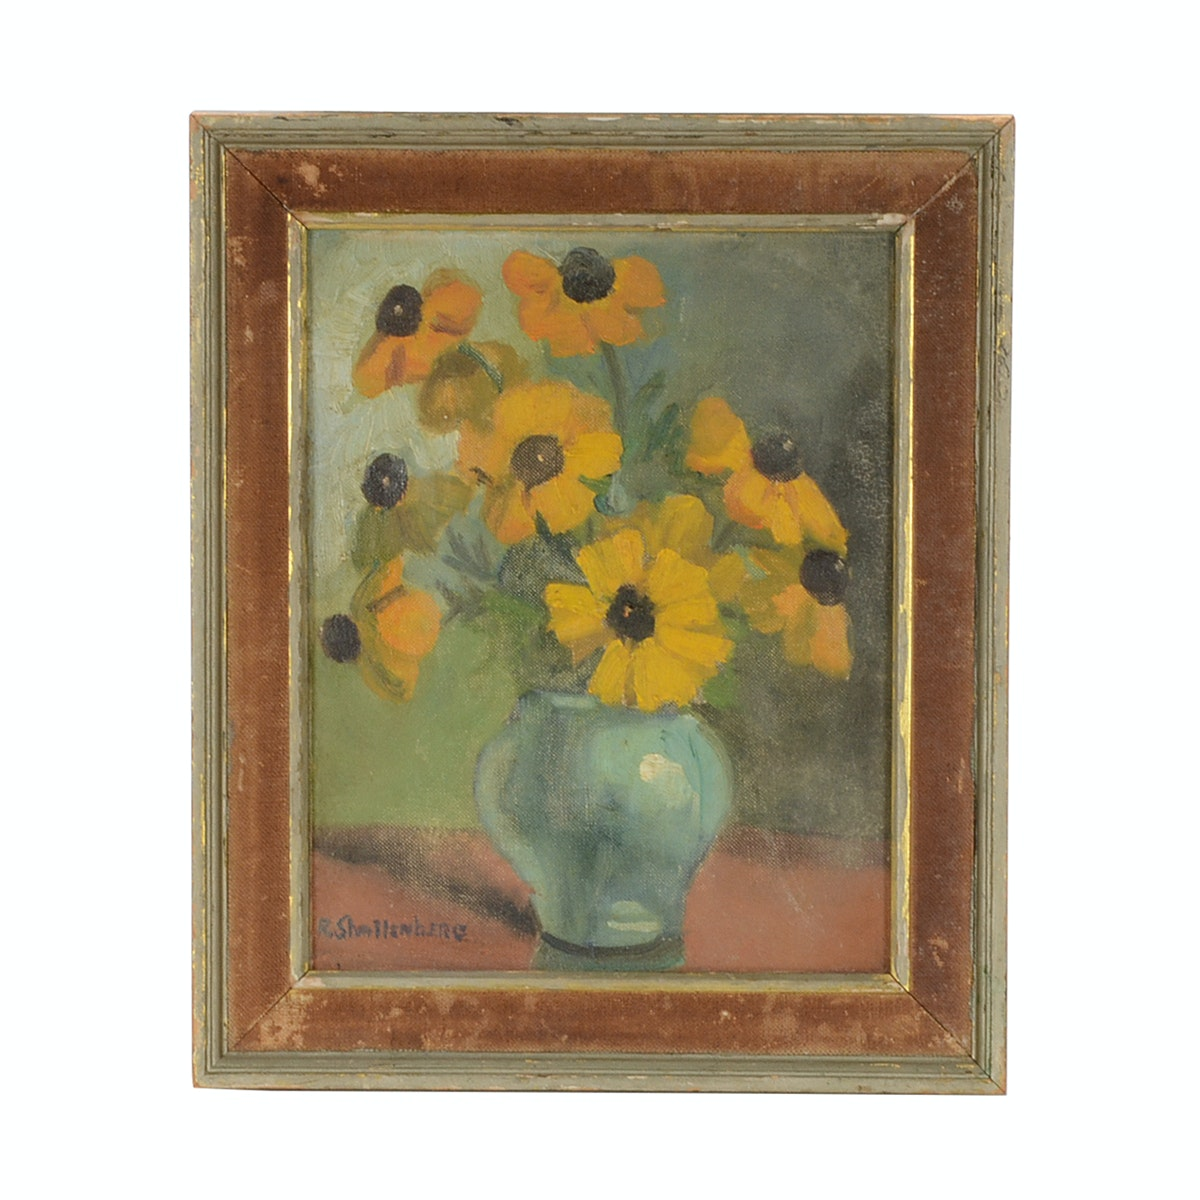 R. Shallenberg Original Floral Still Life Oil on Canvas Board